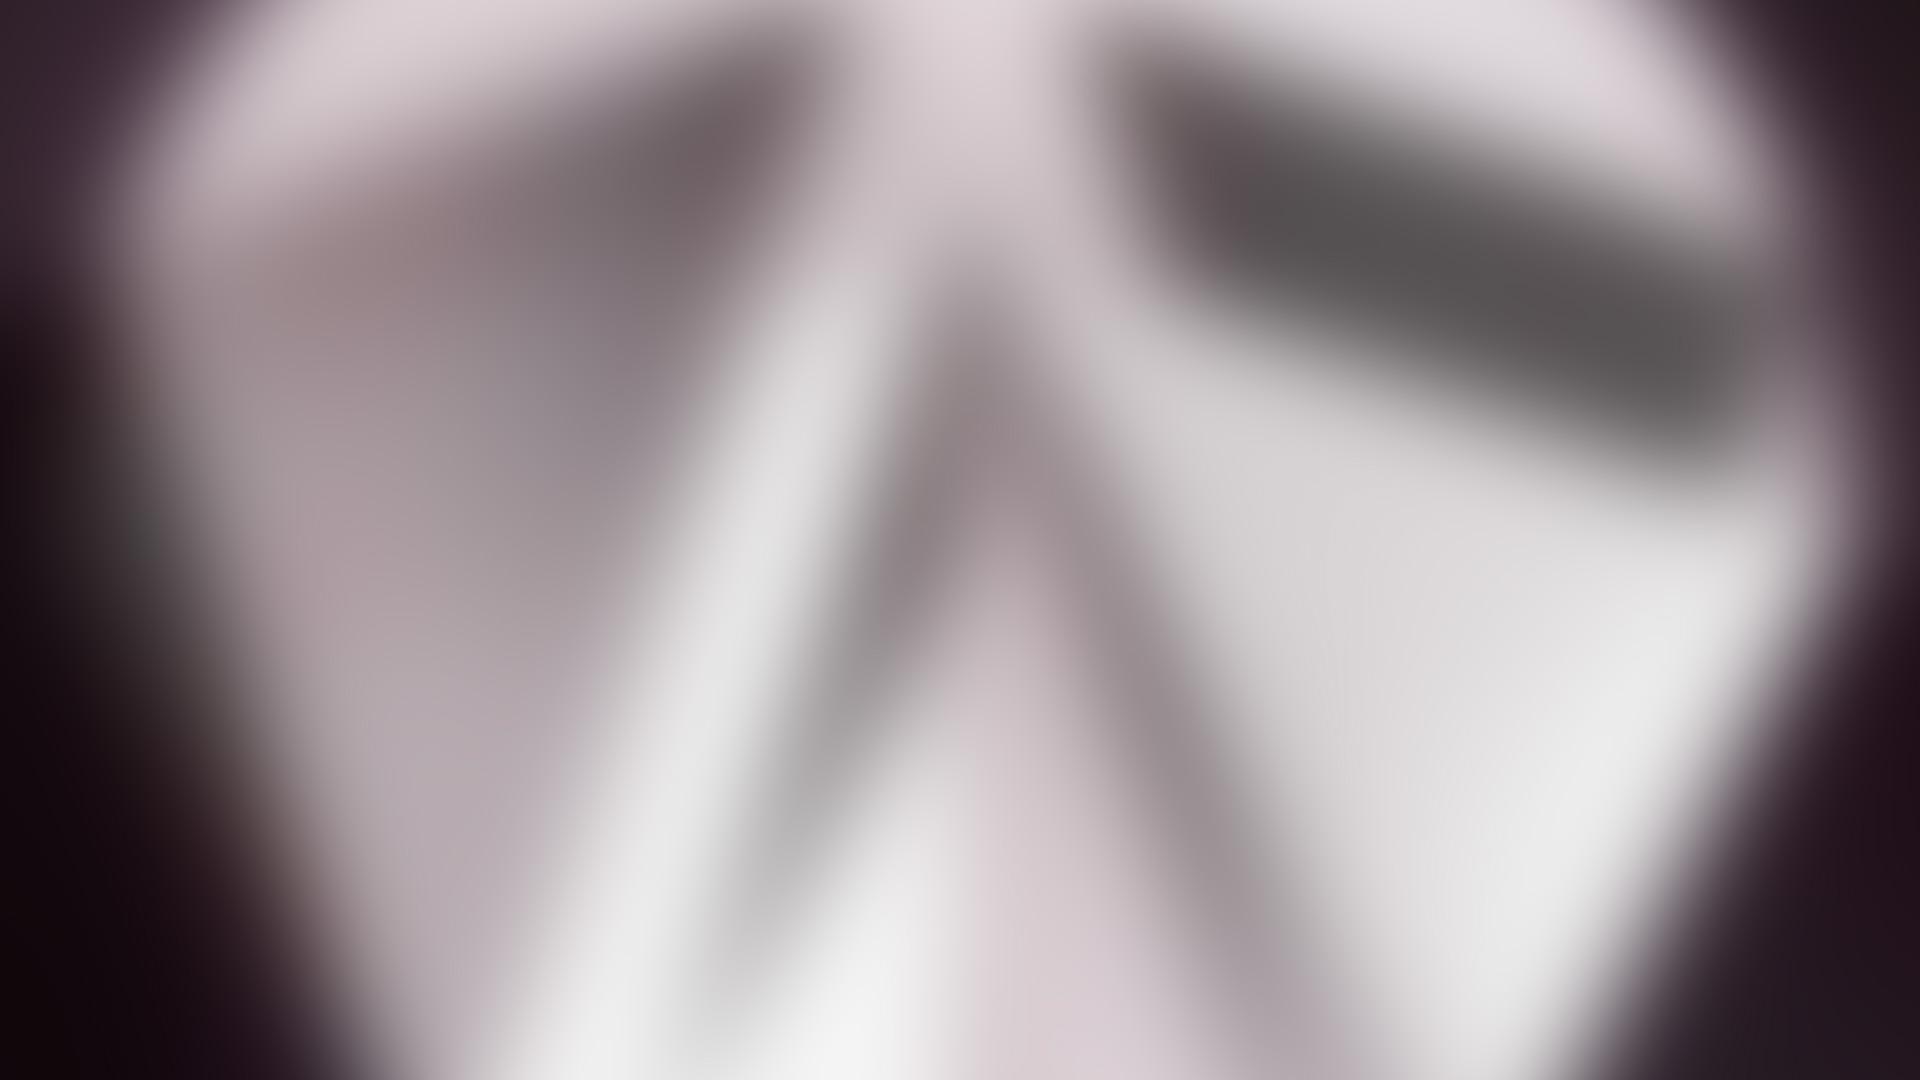 Mobilee214_WaxWings_Falling_bg-blur